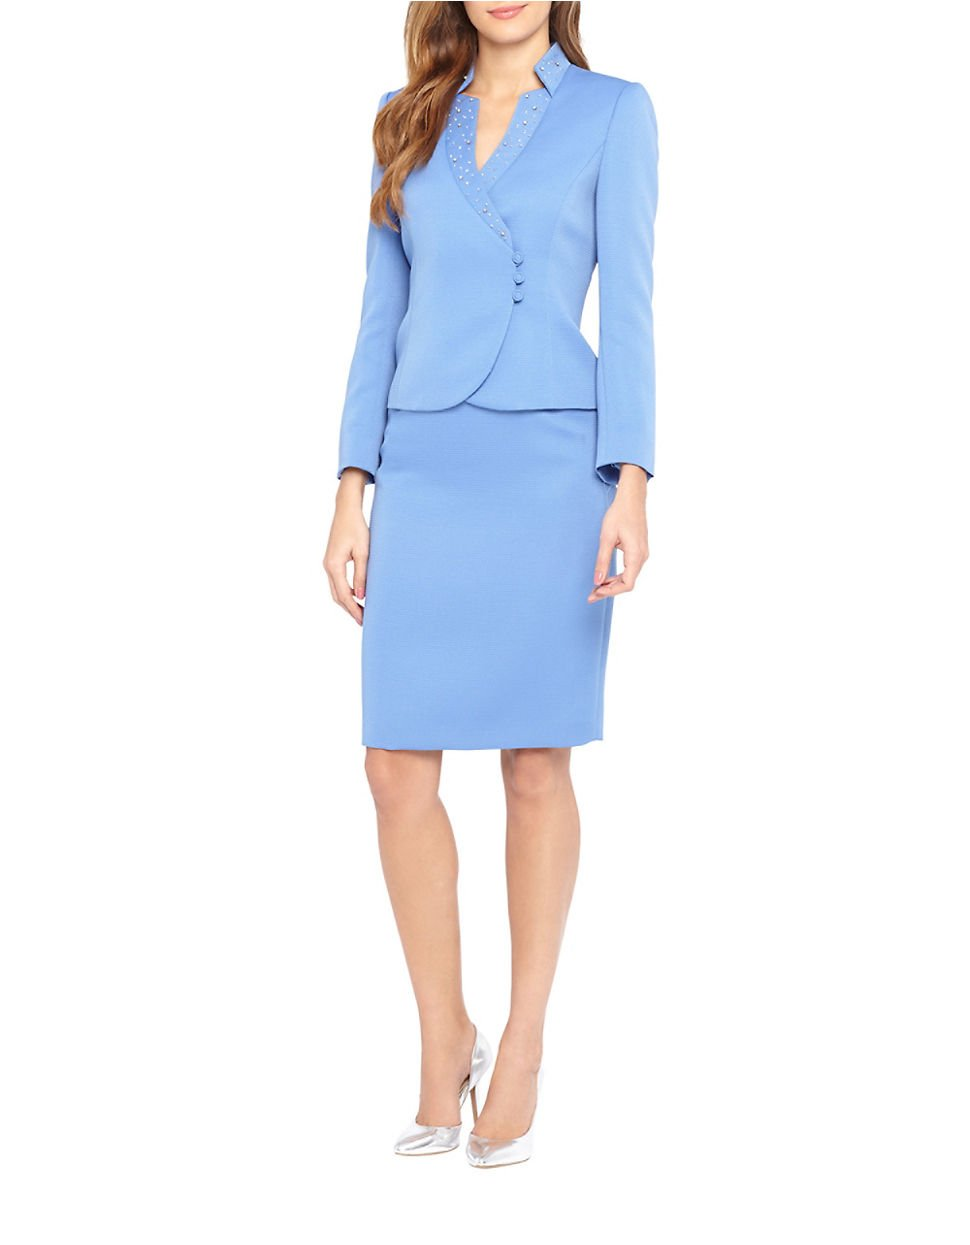 tahari beaded starneck jacket and skirt suit in blue lyst